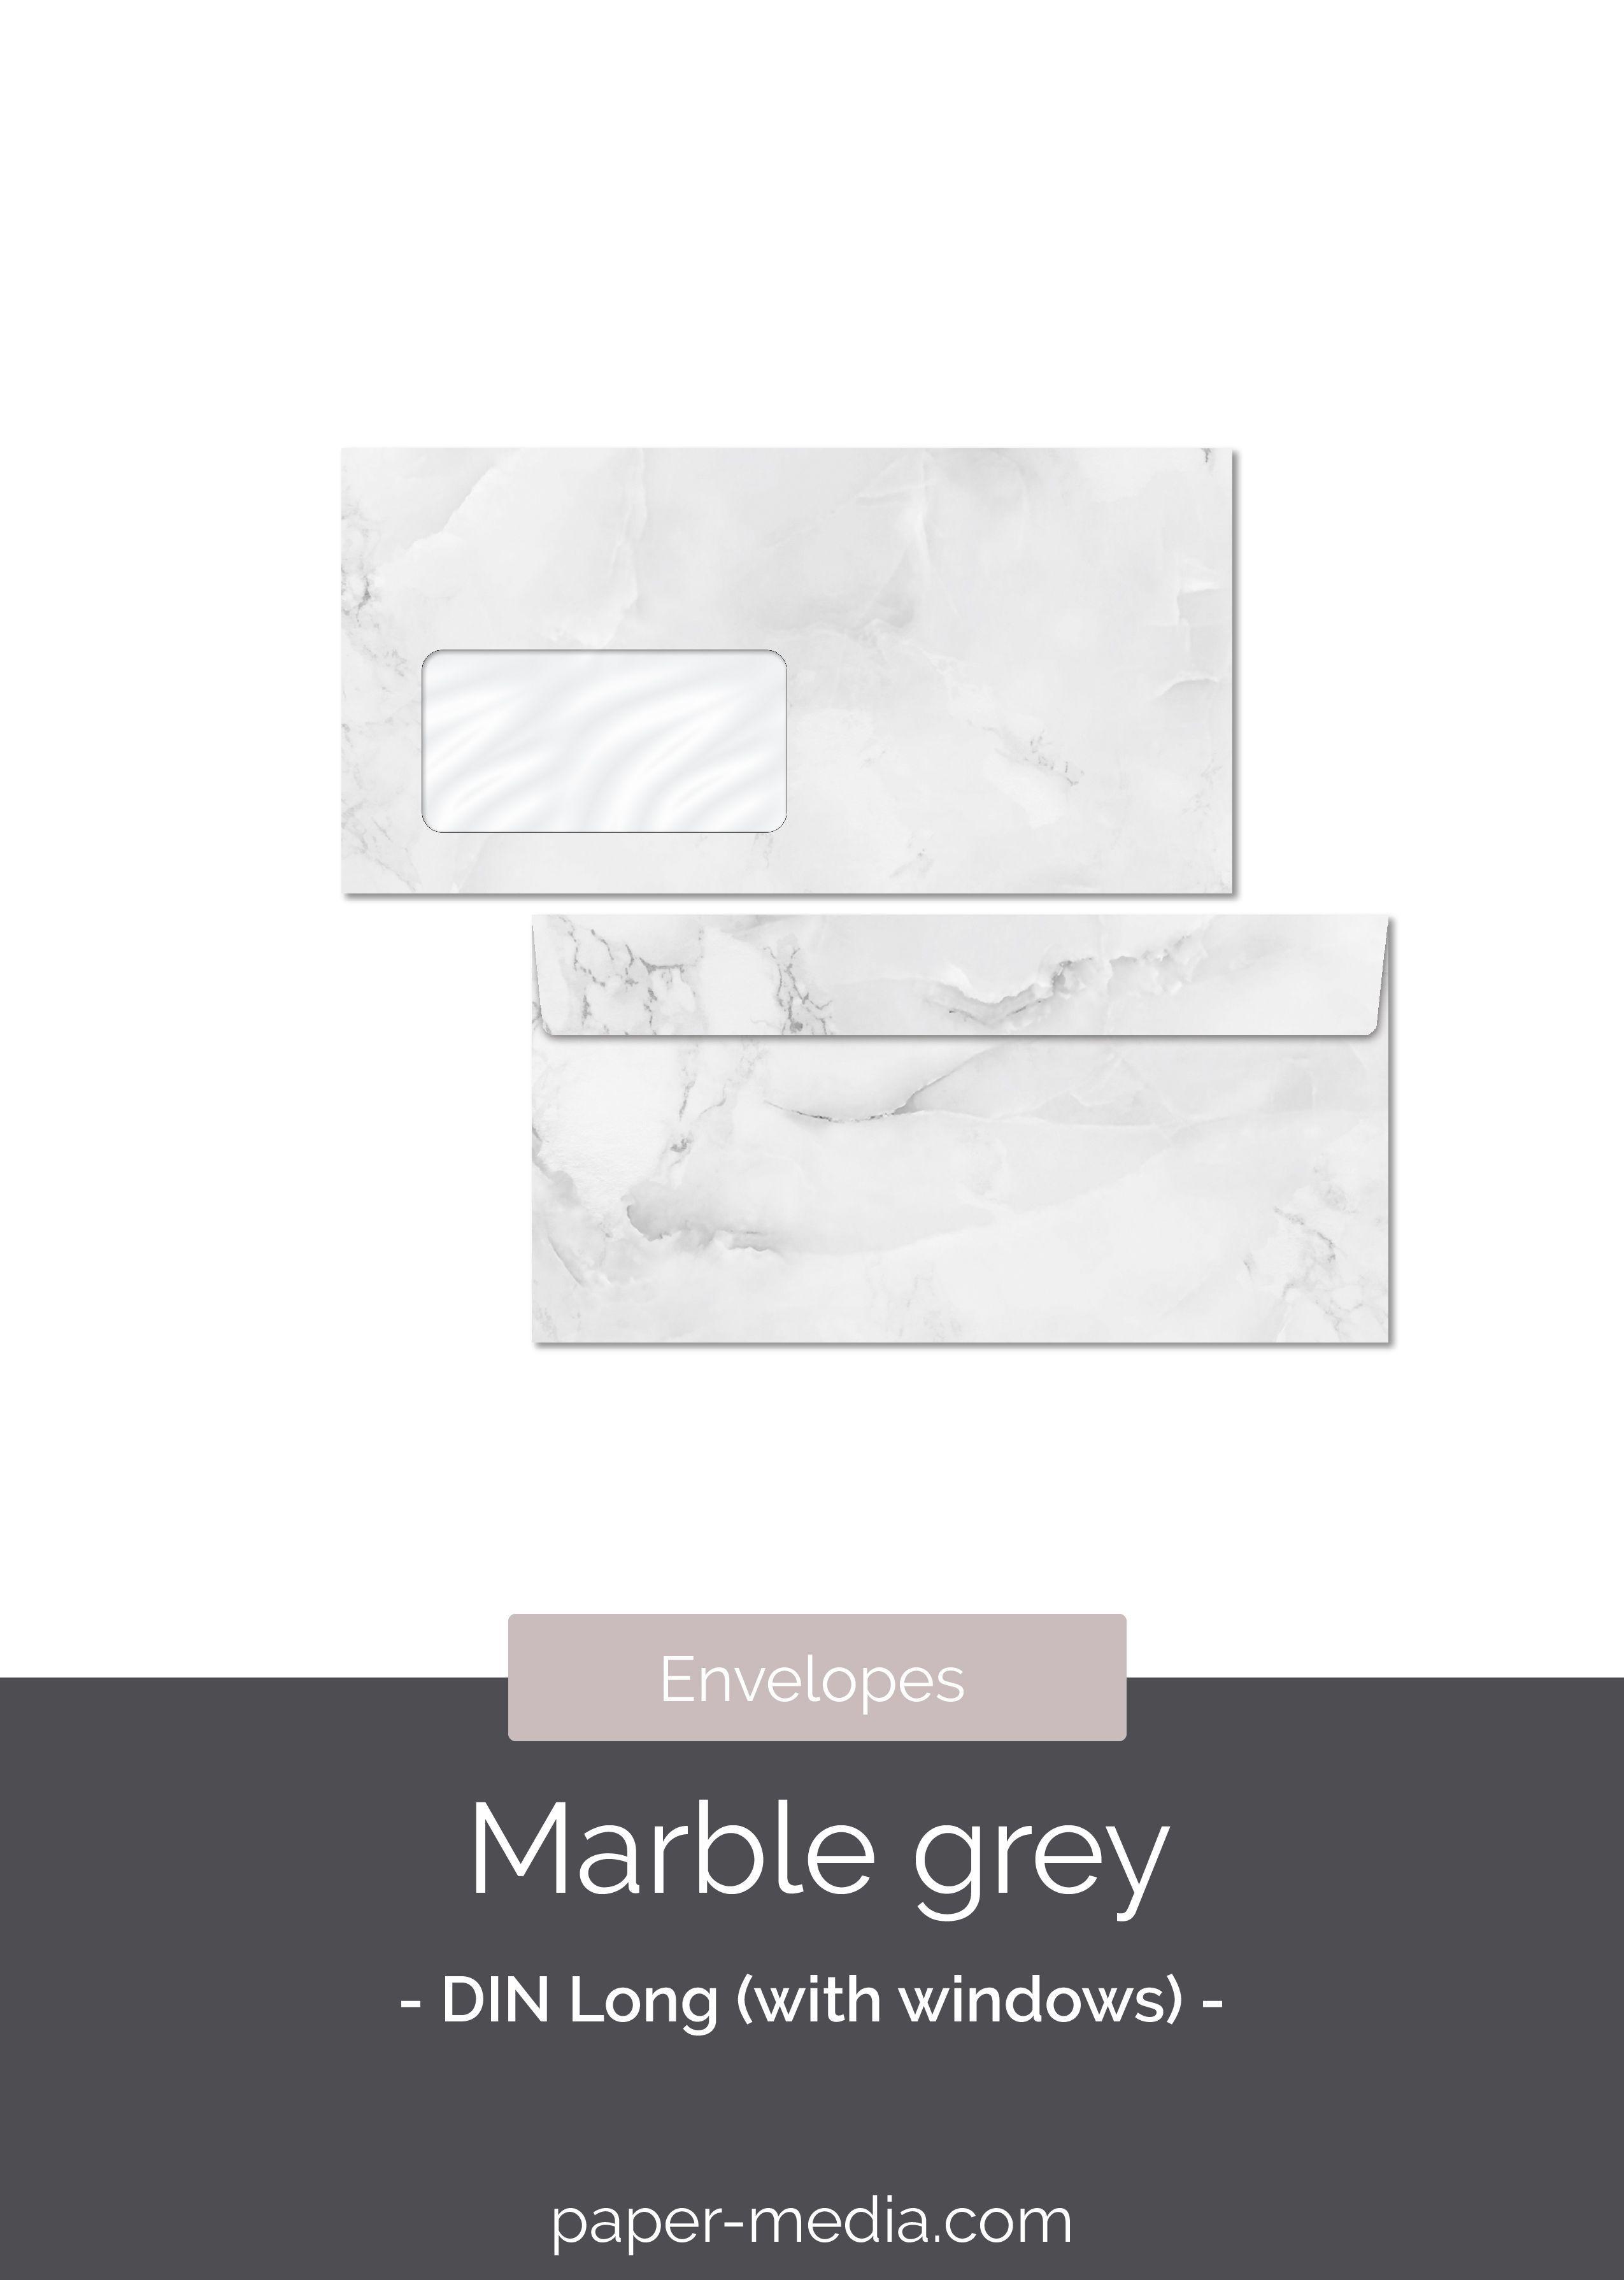 Envelopes Marble Grey Din Long With Windows In 2020 Envelope Marble Elegant Stone